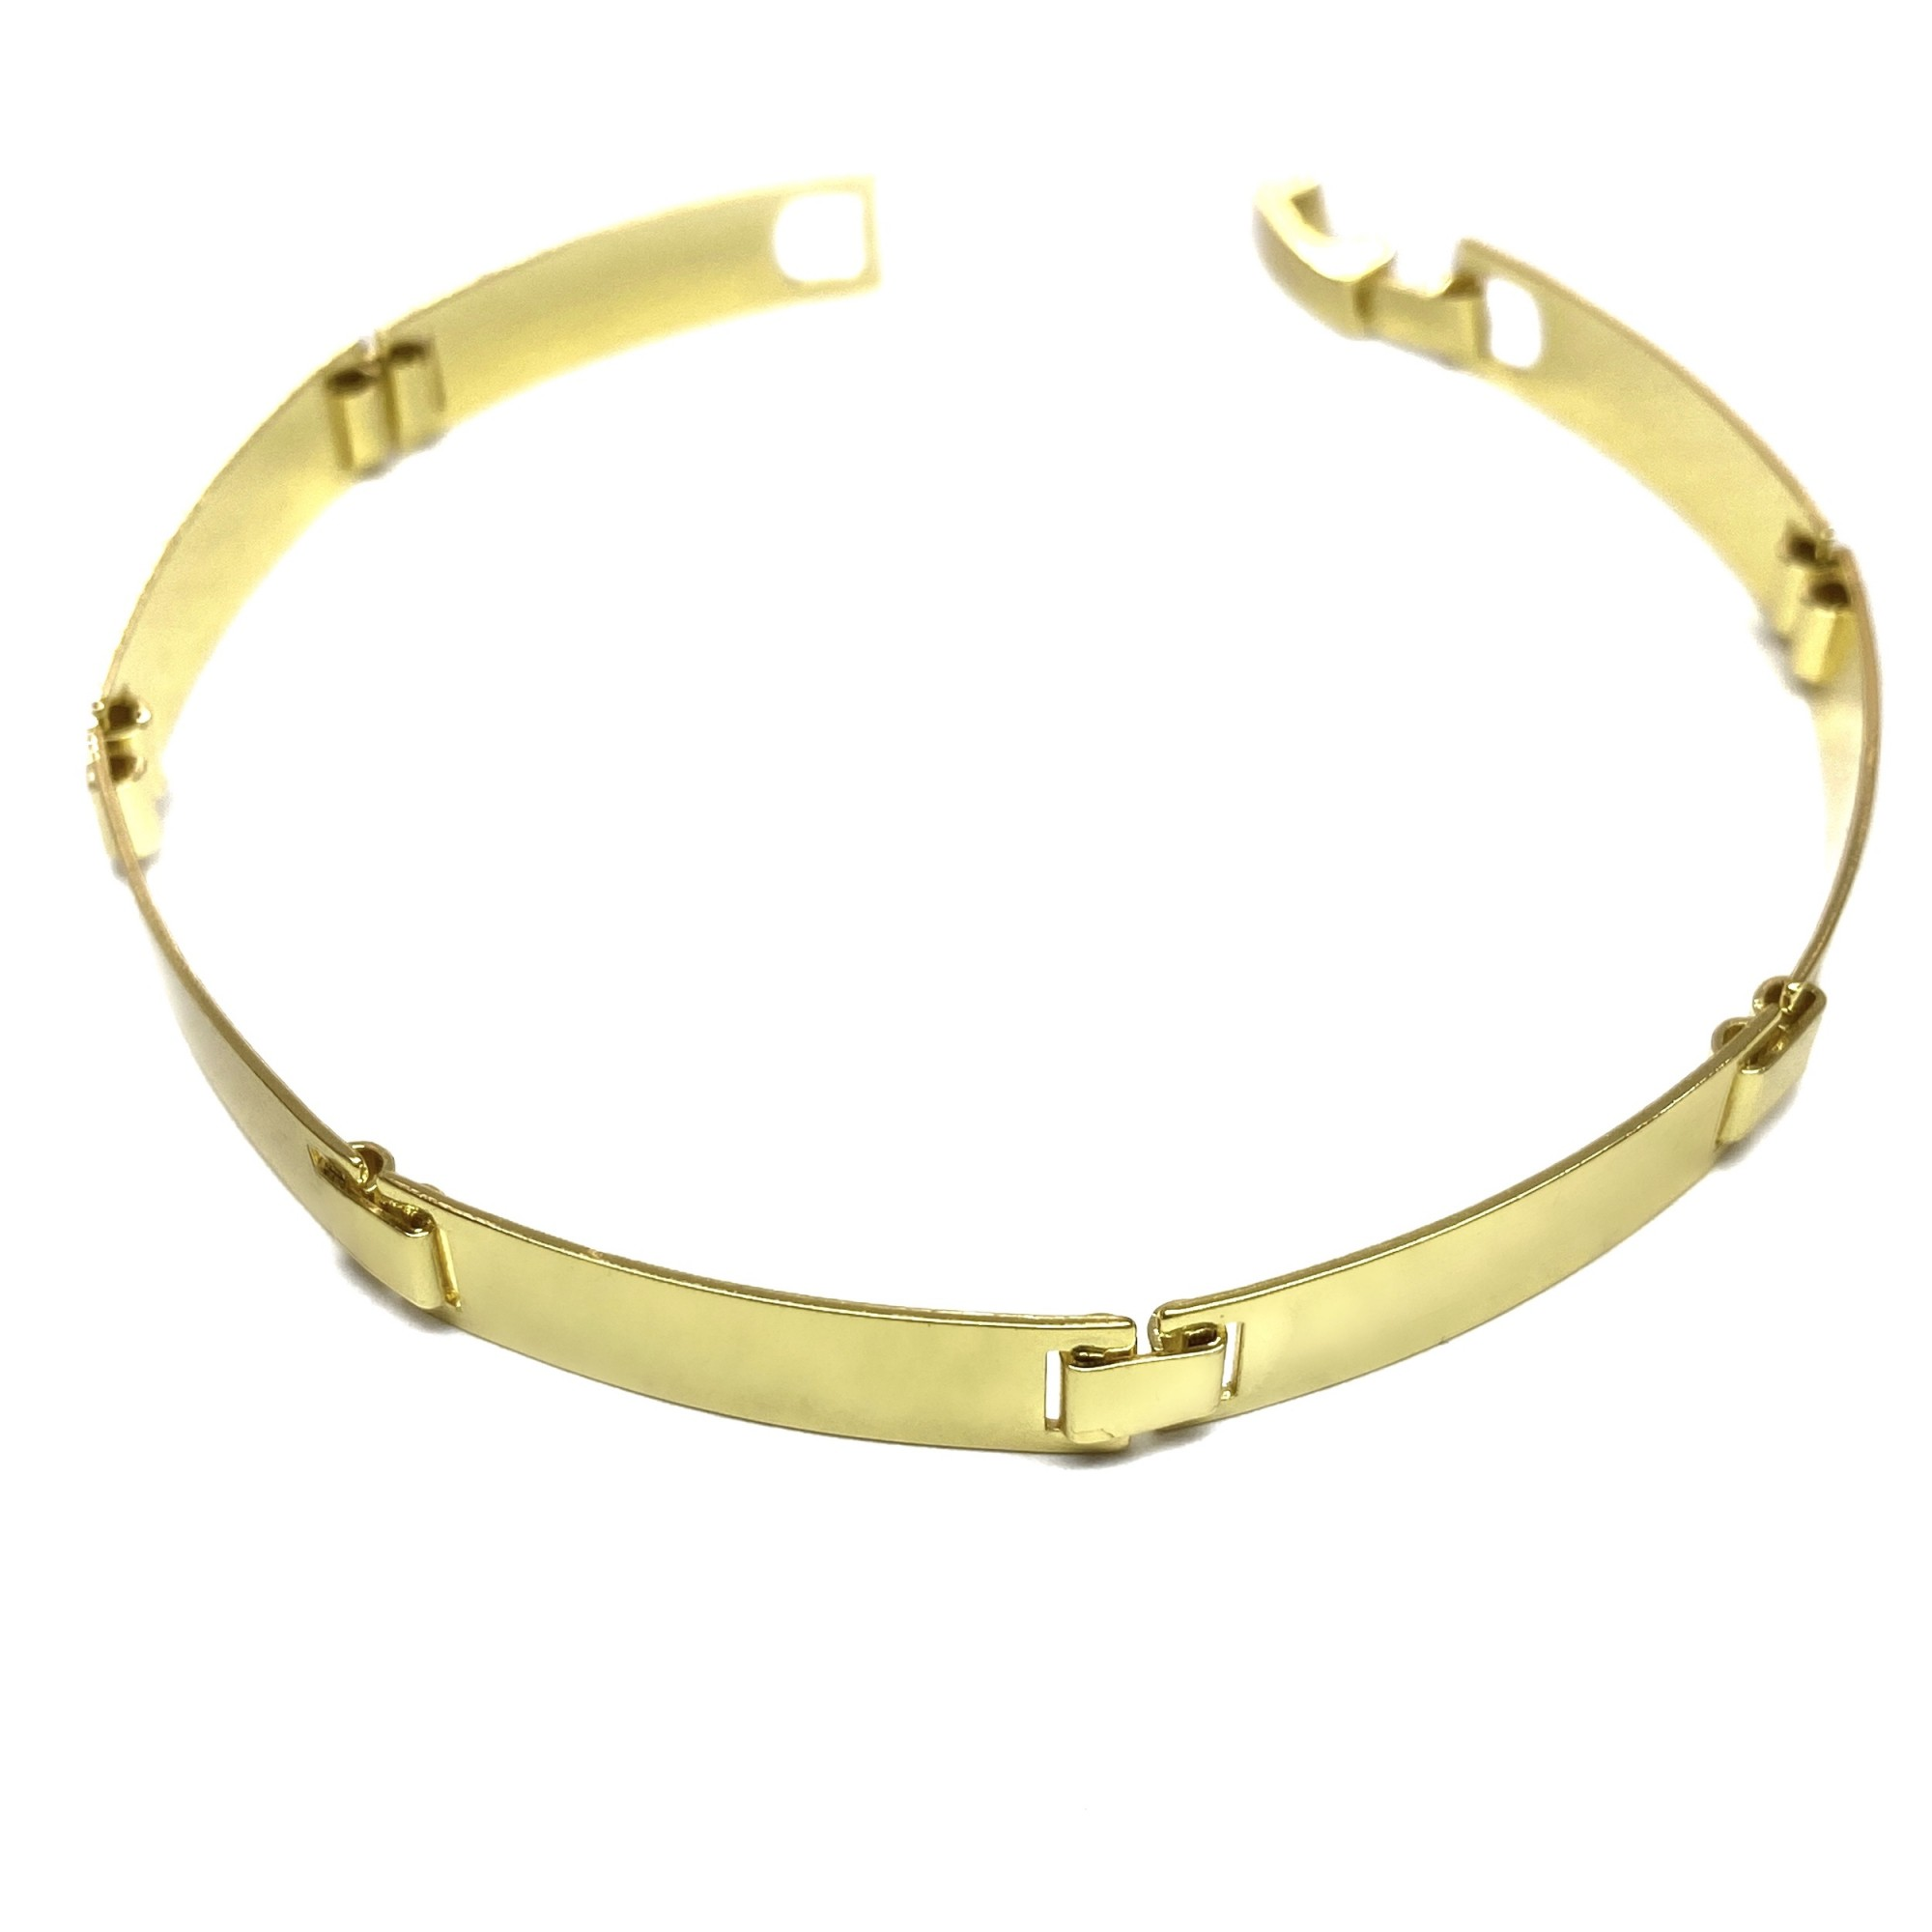 Bracelete Liso 7mm 8,5g (Banho Ouro 24k)